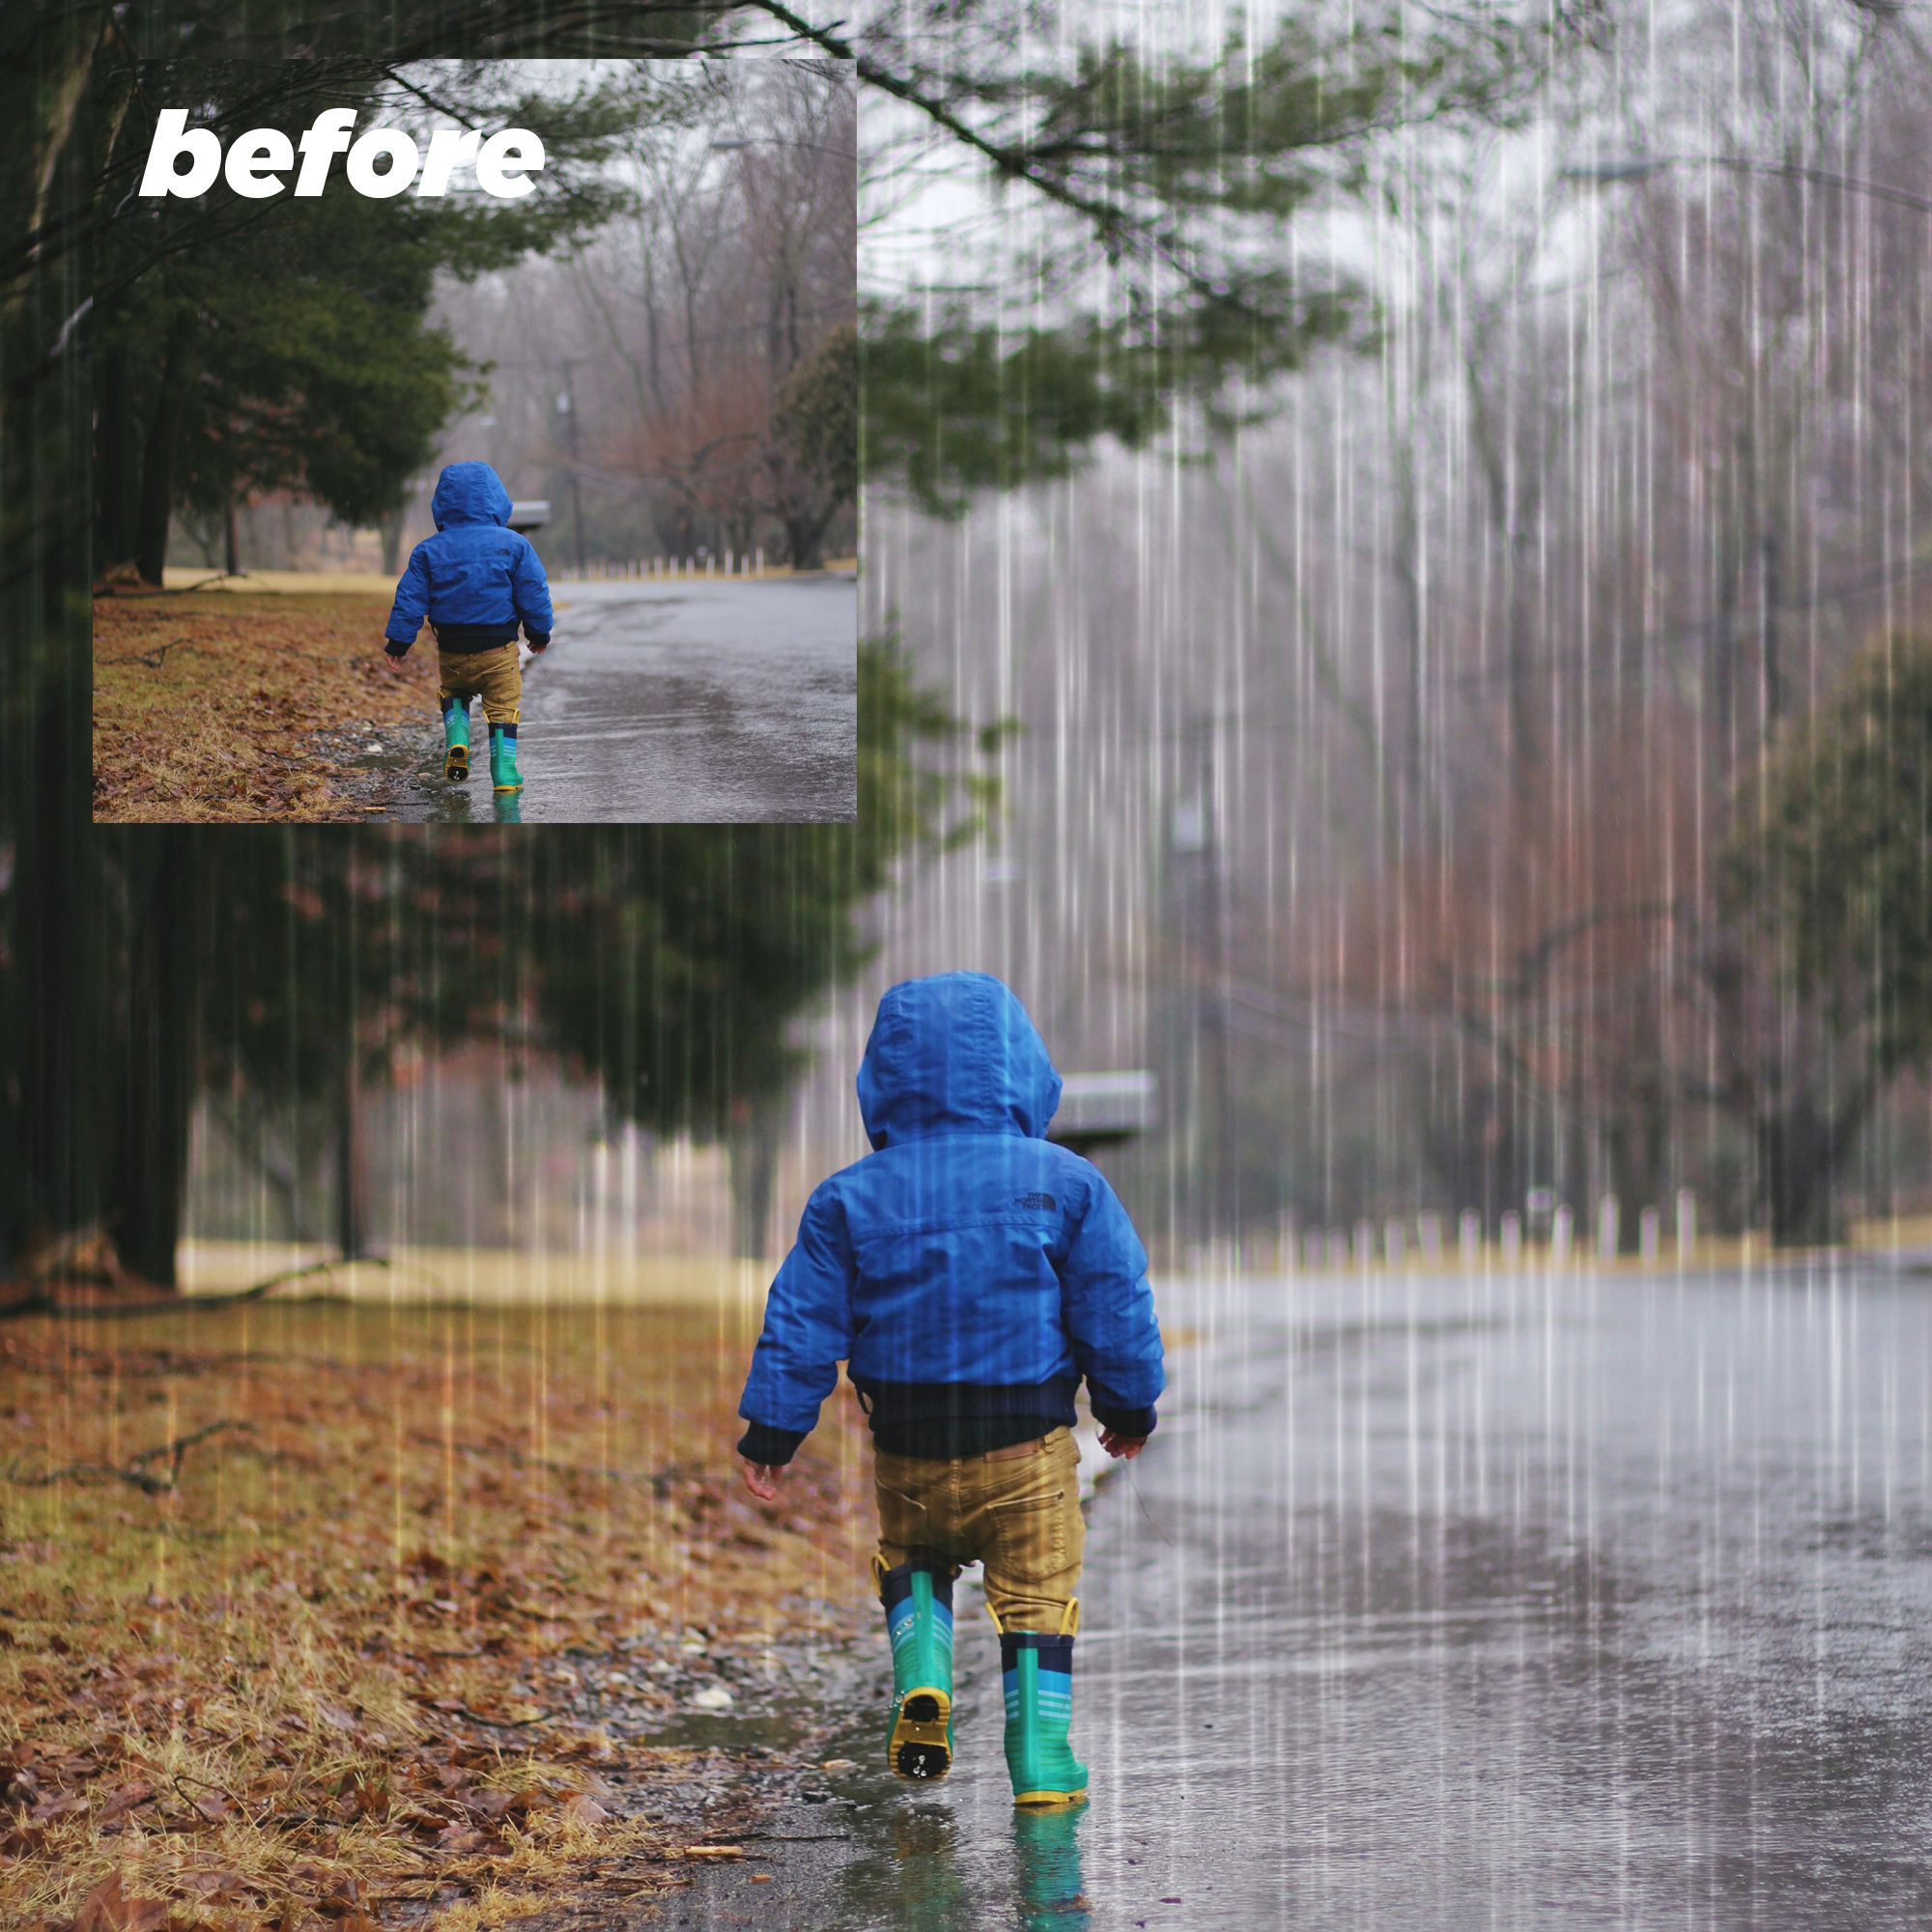 Rain Overlays Clipart, Falling Rain, Photoshop Overlays example image 2